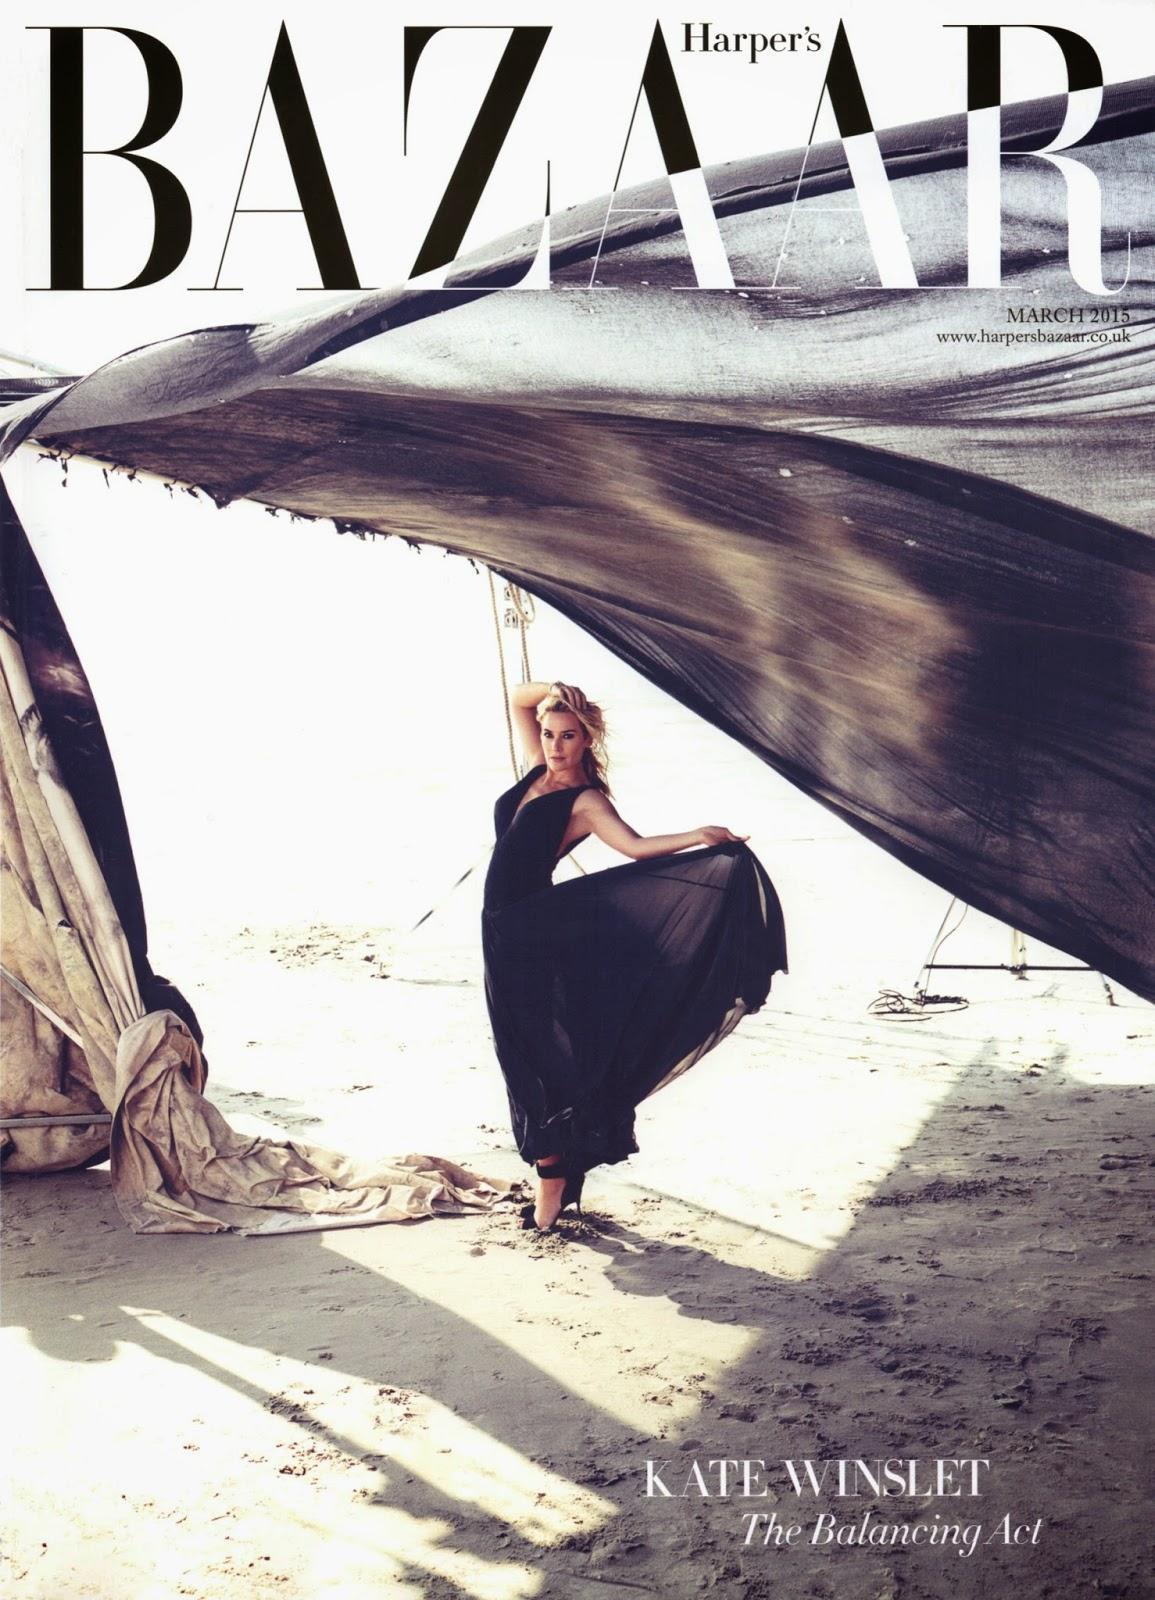 Actress , Soundtrack,singer: Kate Winslet for Harper's Bazaar UK